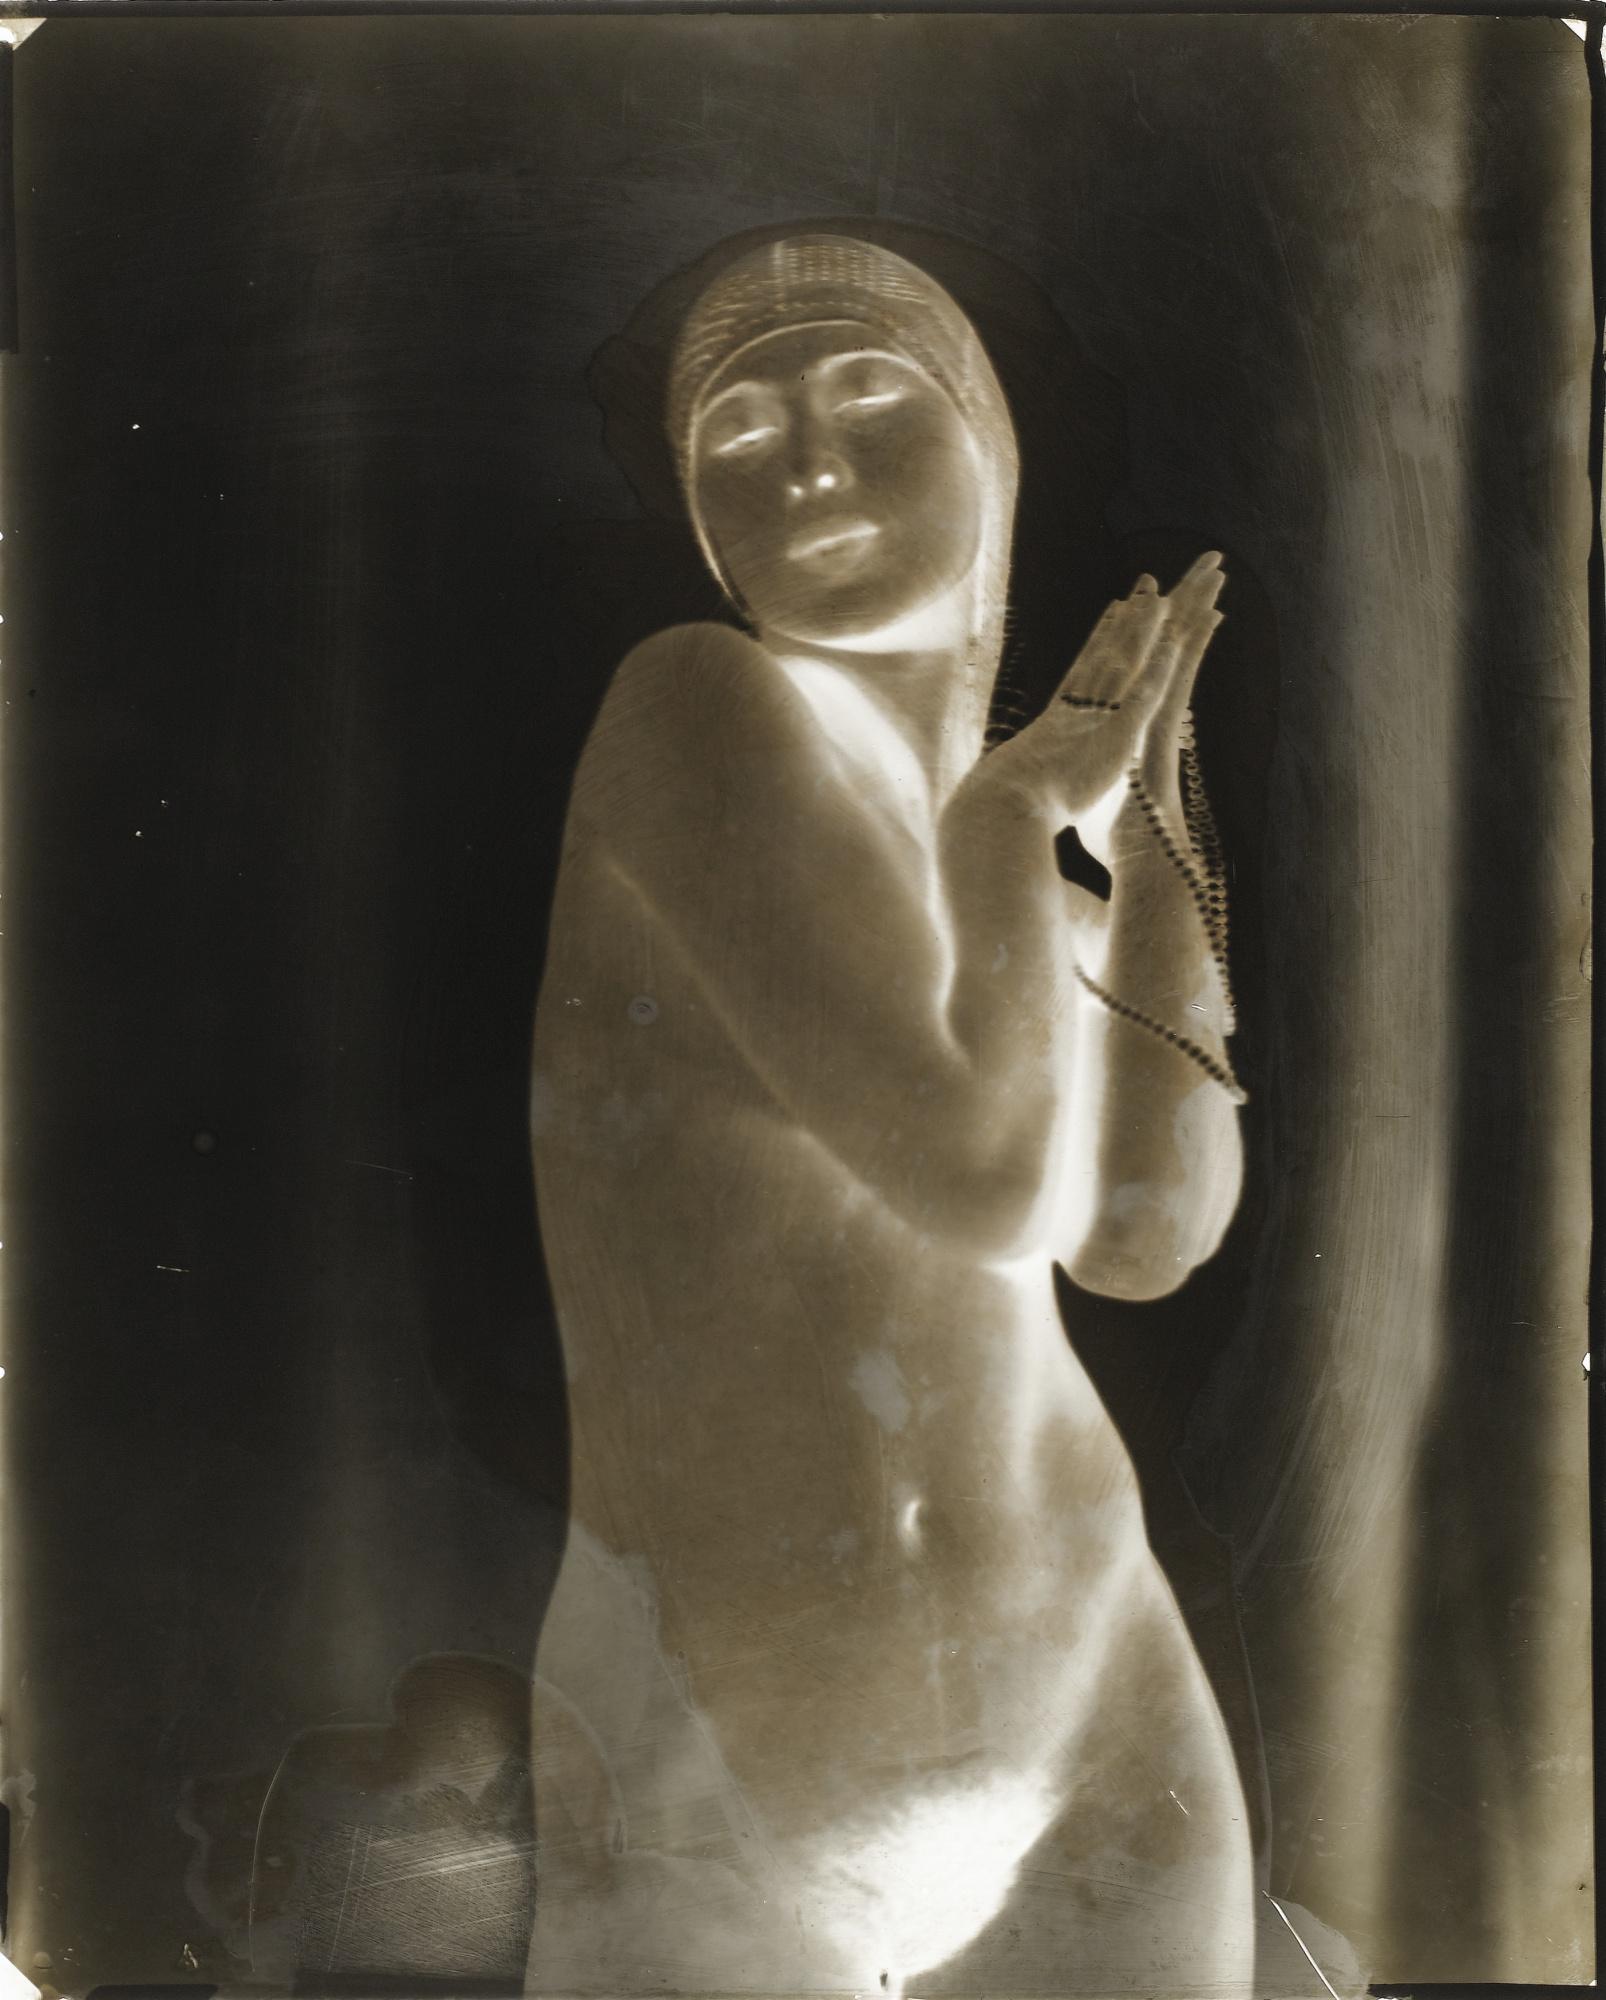 Frantisek Drtikol-Turbanned Woman With Pearls' Vers-1930